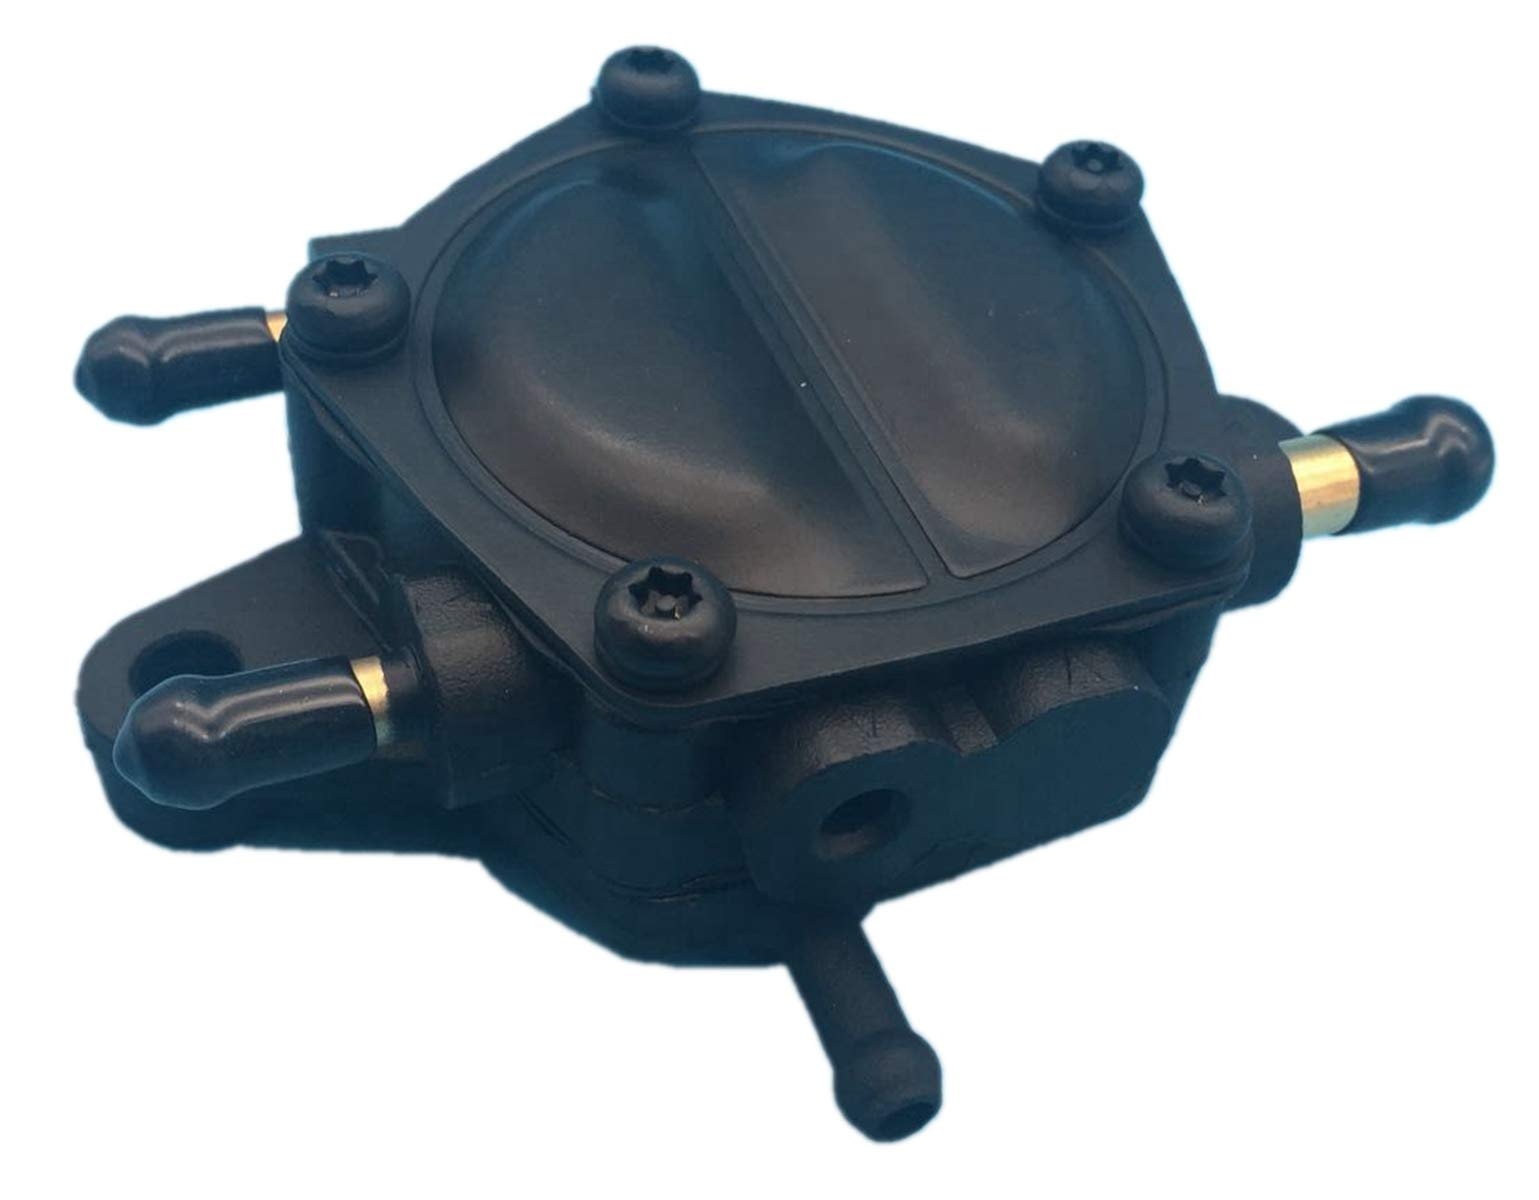 Tuzliufi Fuel Pump Replace Yamaha Rhino Yxr450 Yxr660 Grizzly Yfm660 For Mikuni Df62 702 42 5312